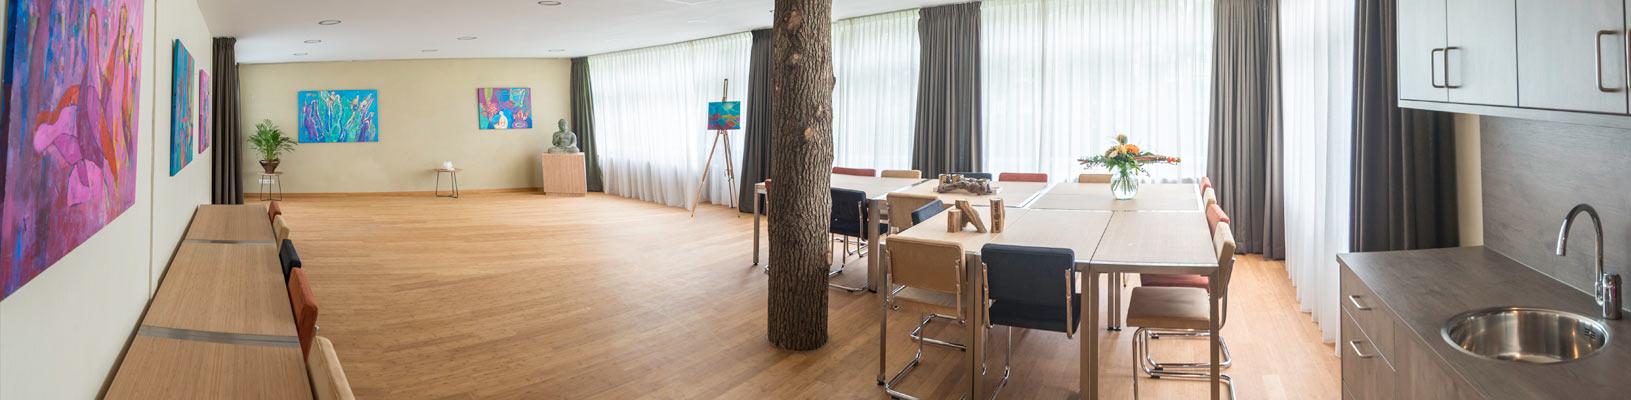 Lezing TRE® Stress- & Traumaherstel HeelHuus Gezondheidscentrum Warnsveld Zutphen